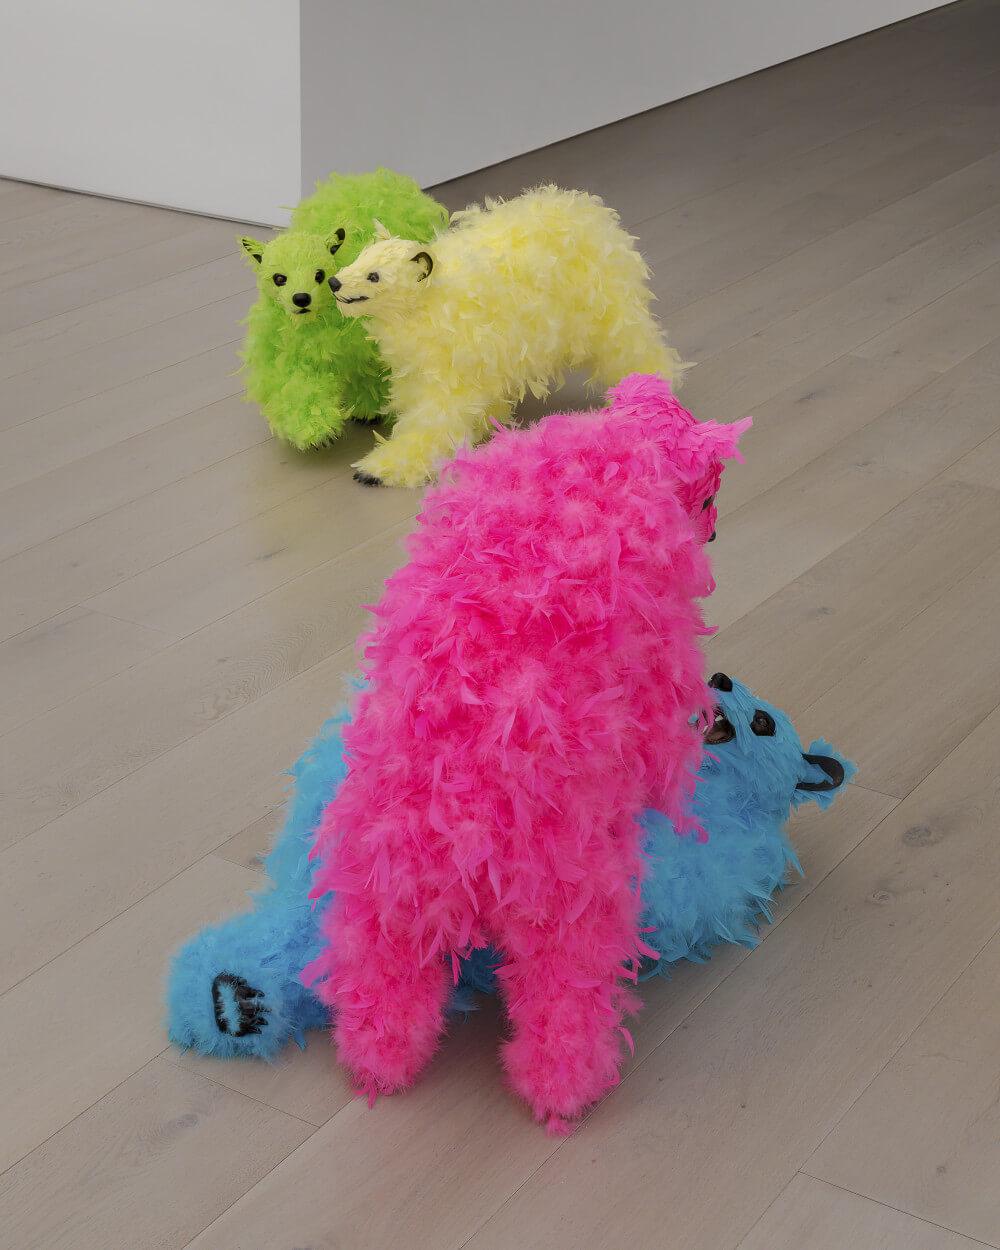 osos de peluche y plumas de Paola Pivi